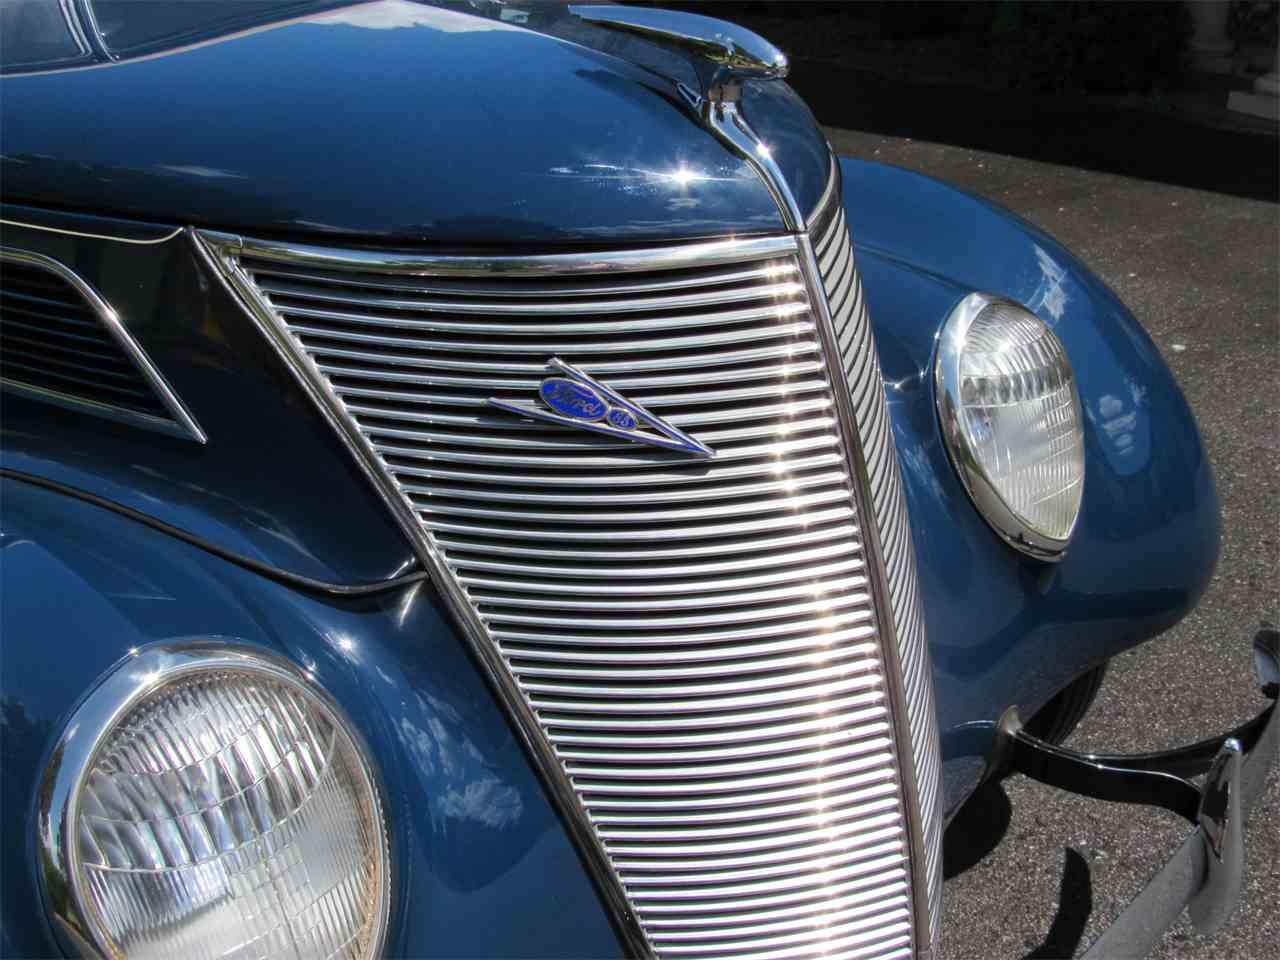 1937 Ford V8 Deluxe Convertible Sedan For Sale